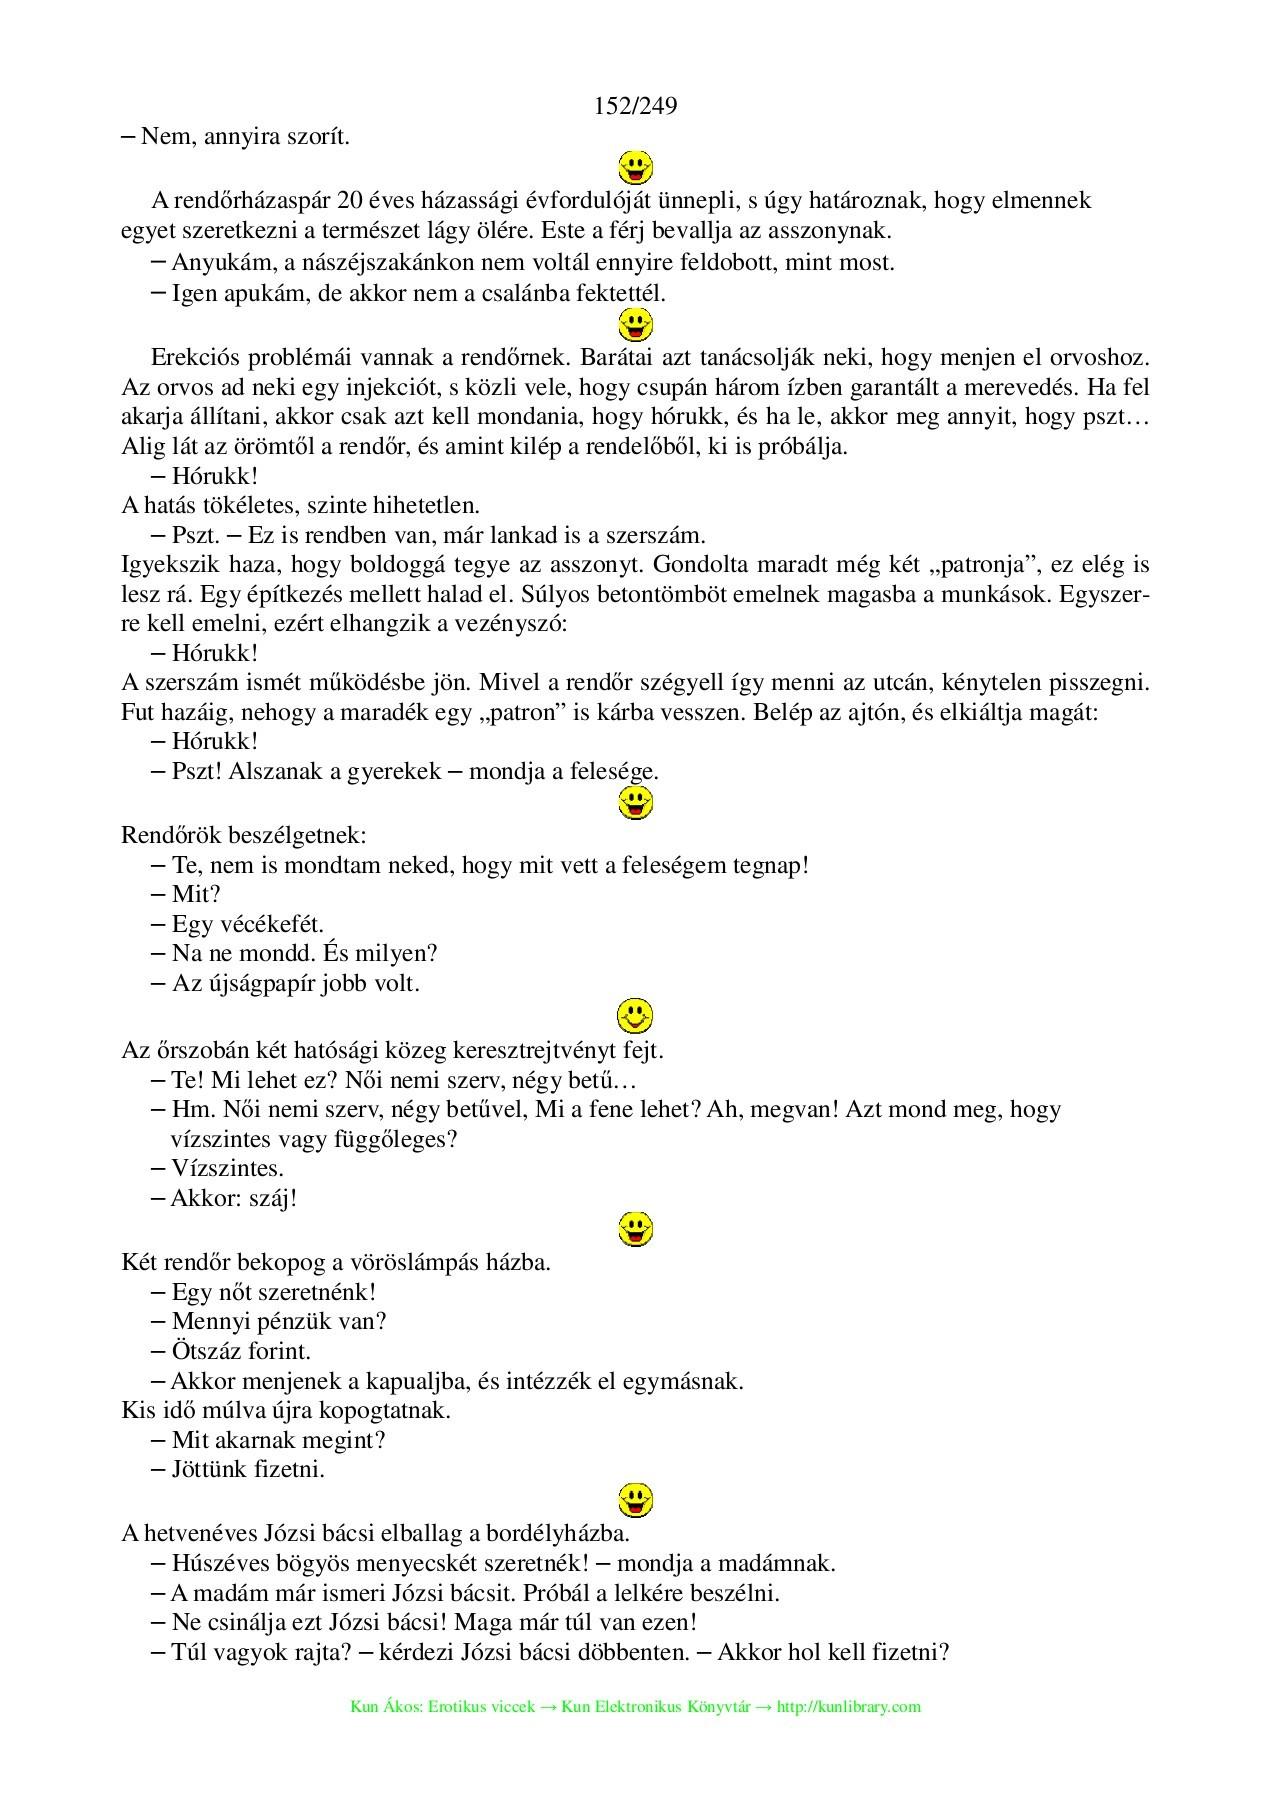 Orvos válaszol | terezvarosibucsu.hu